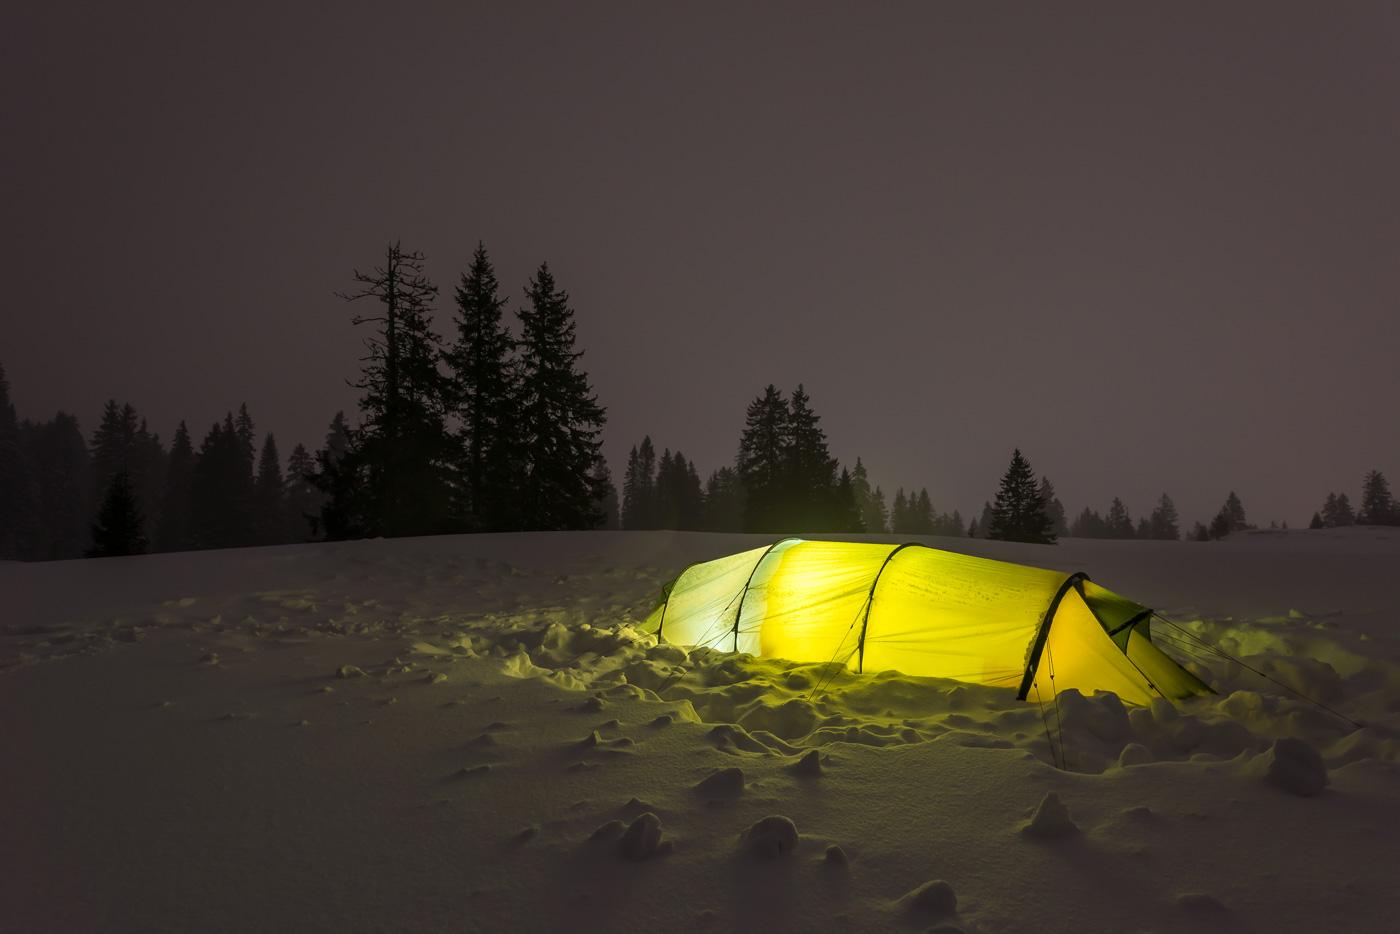 Zeltplatz bei Nacht